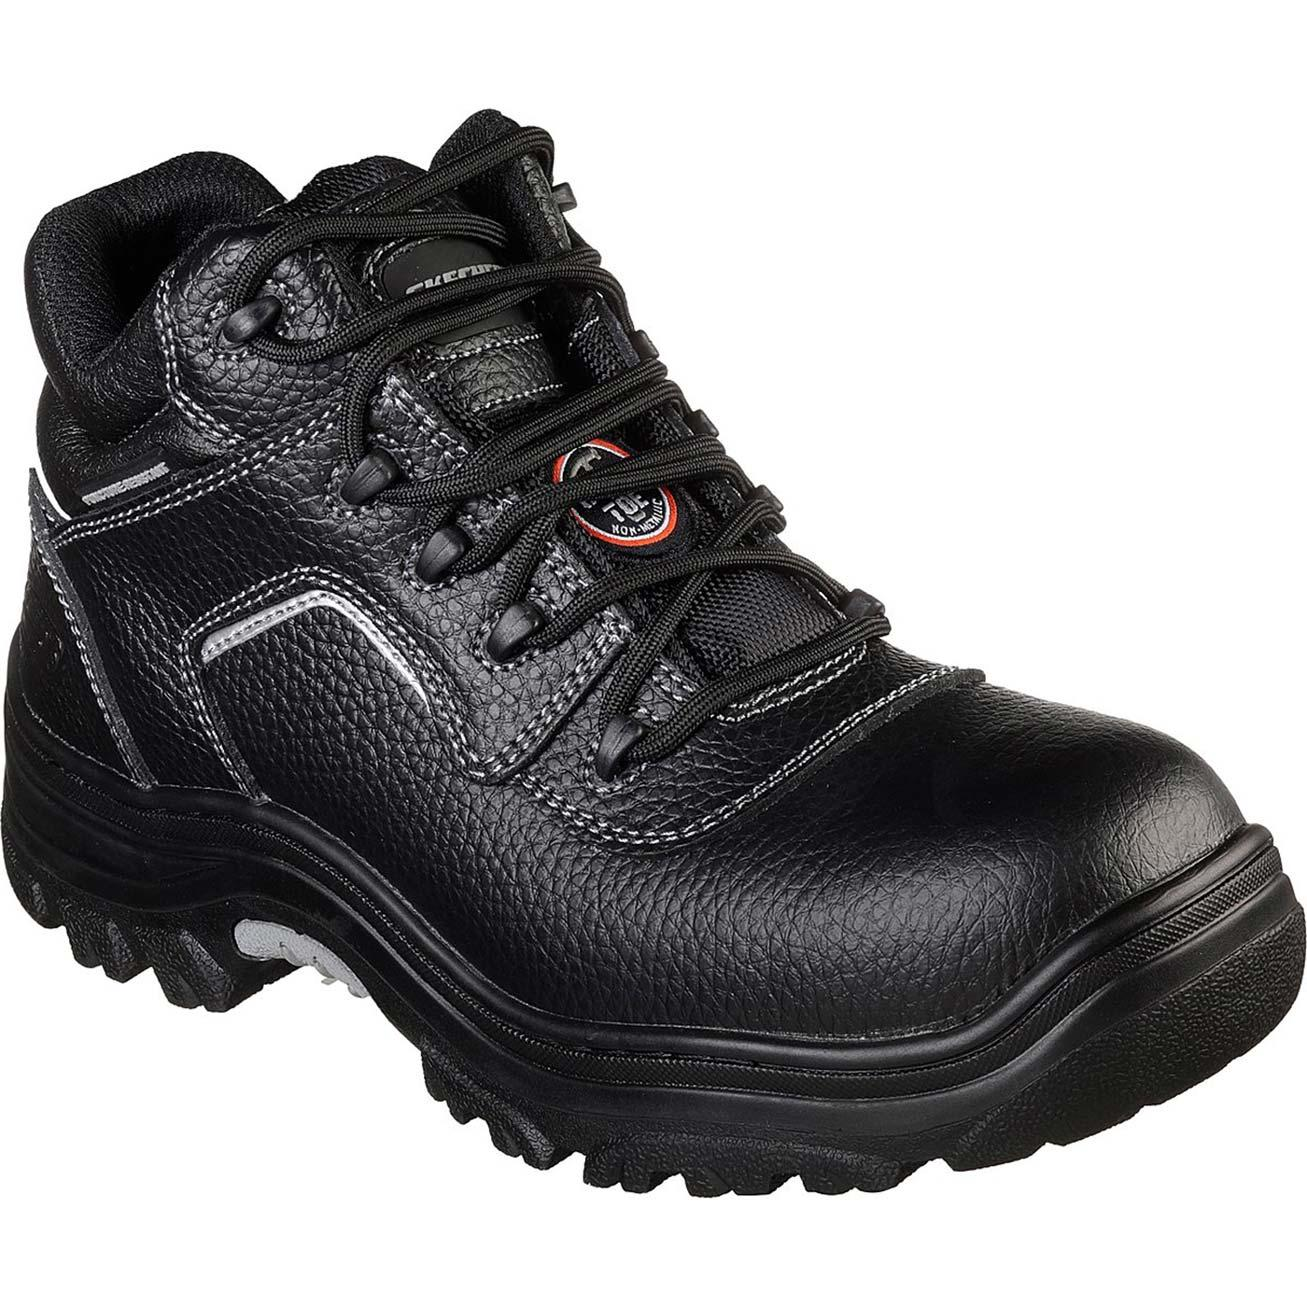 e1b045b71dc SKECHERS Work Burgin Sosder Composite Toe Puncture-Resistant Work Boot